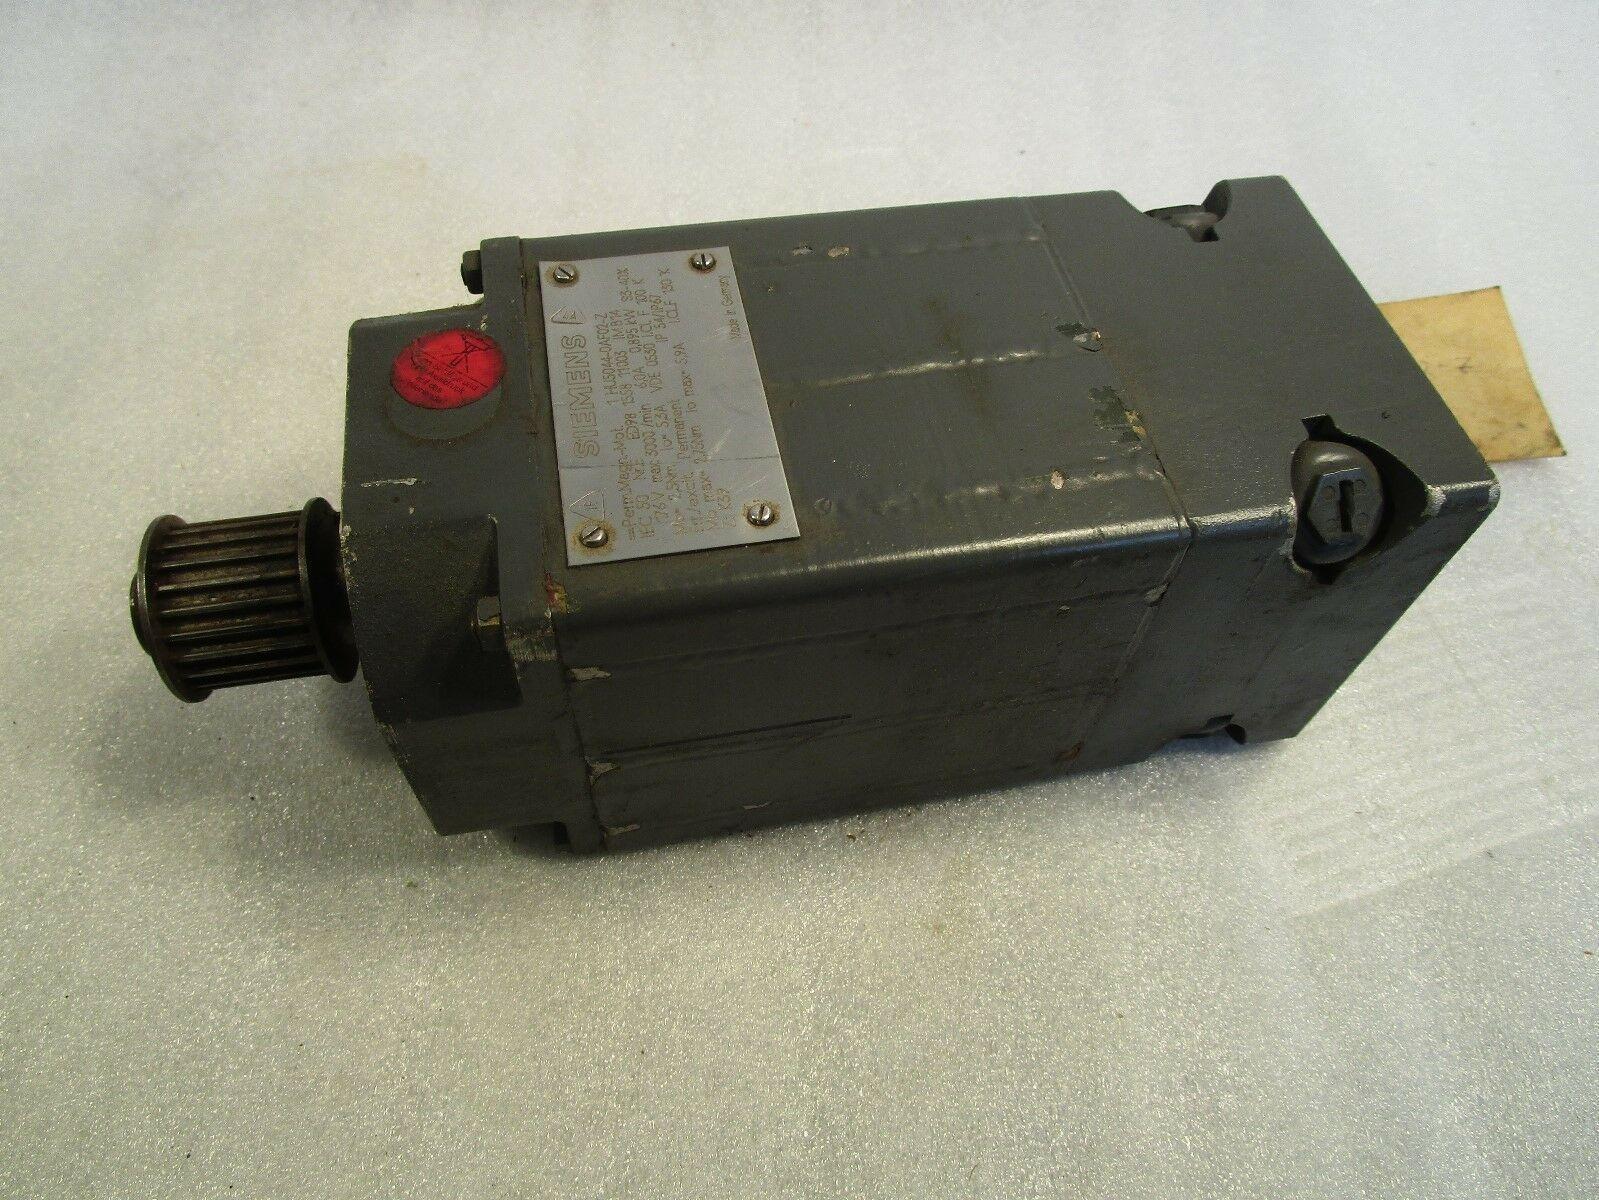 Siemens General Numeric Servo Motor 1HU5044-0AF02-Z